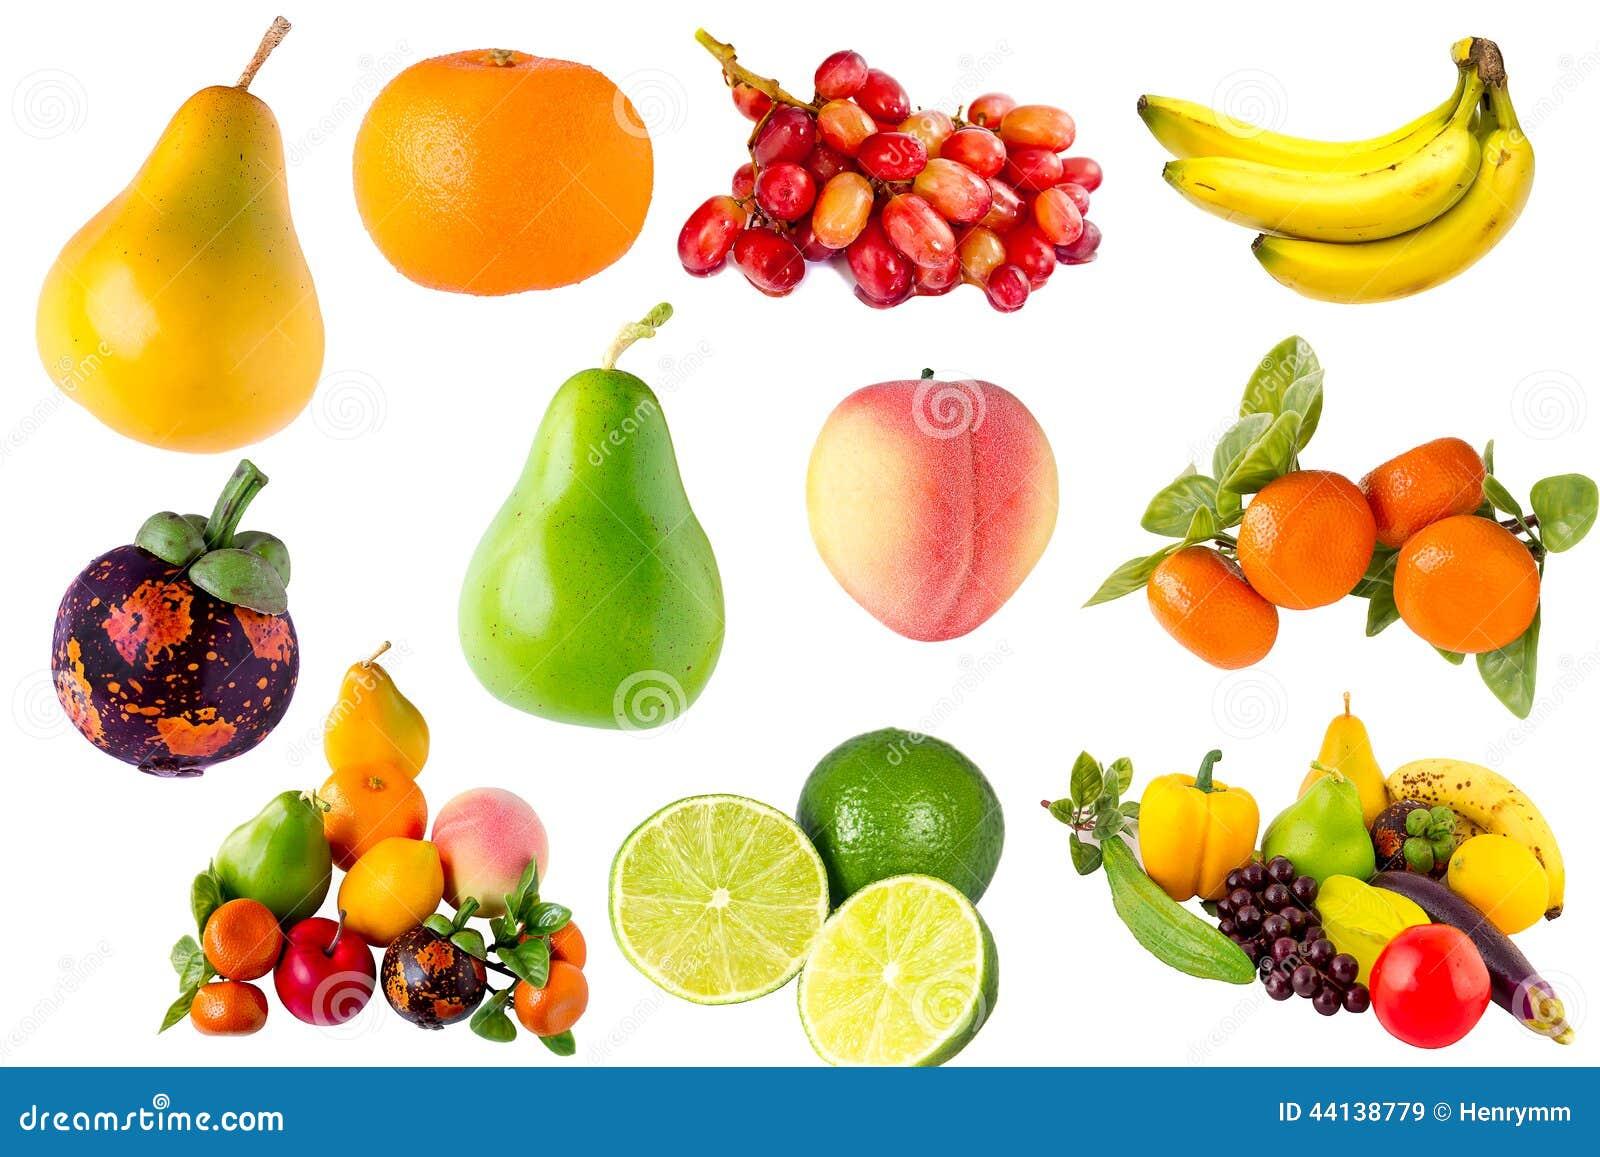 Verse vruchten groenteninzameling